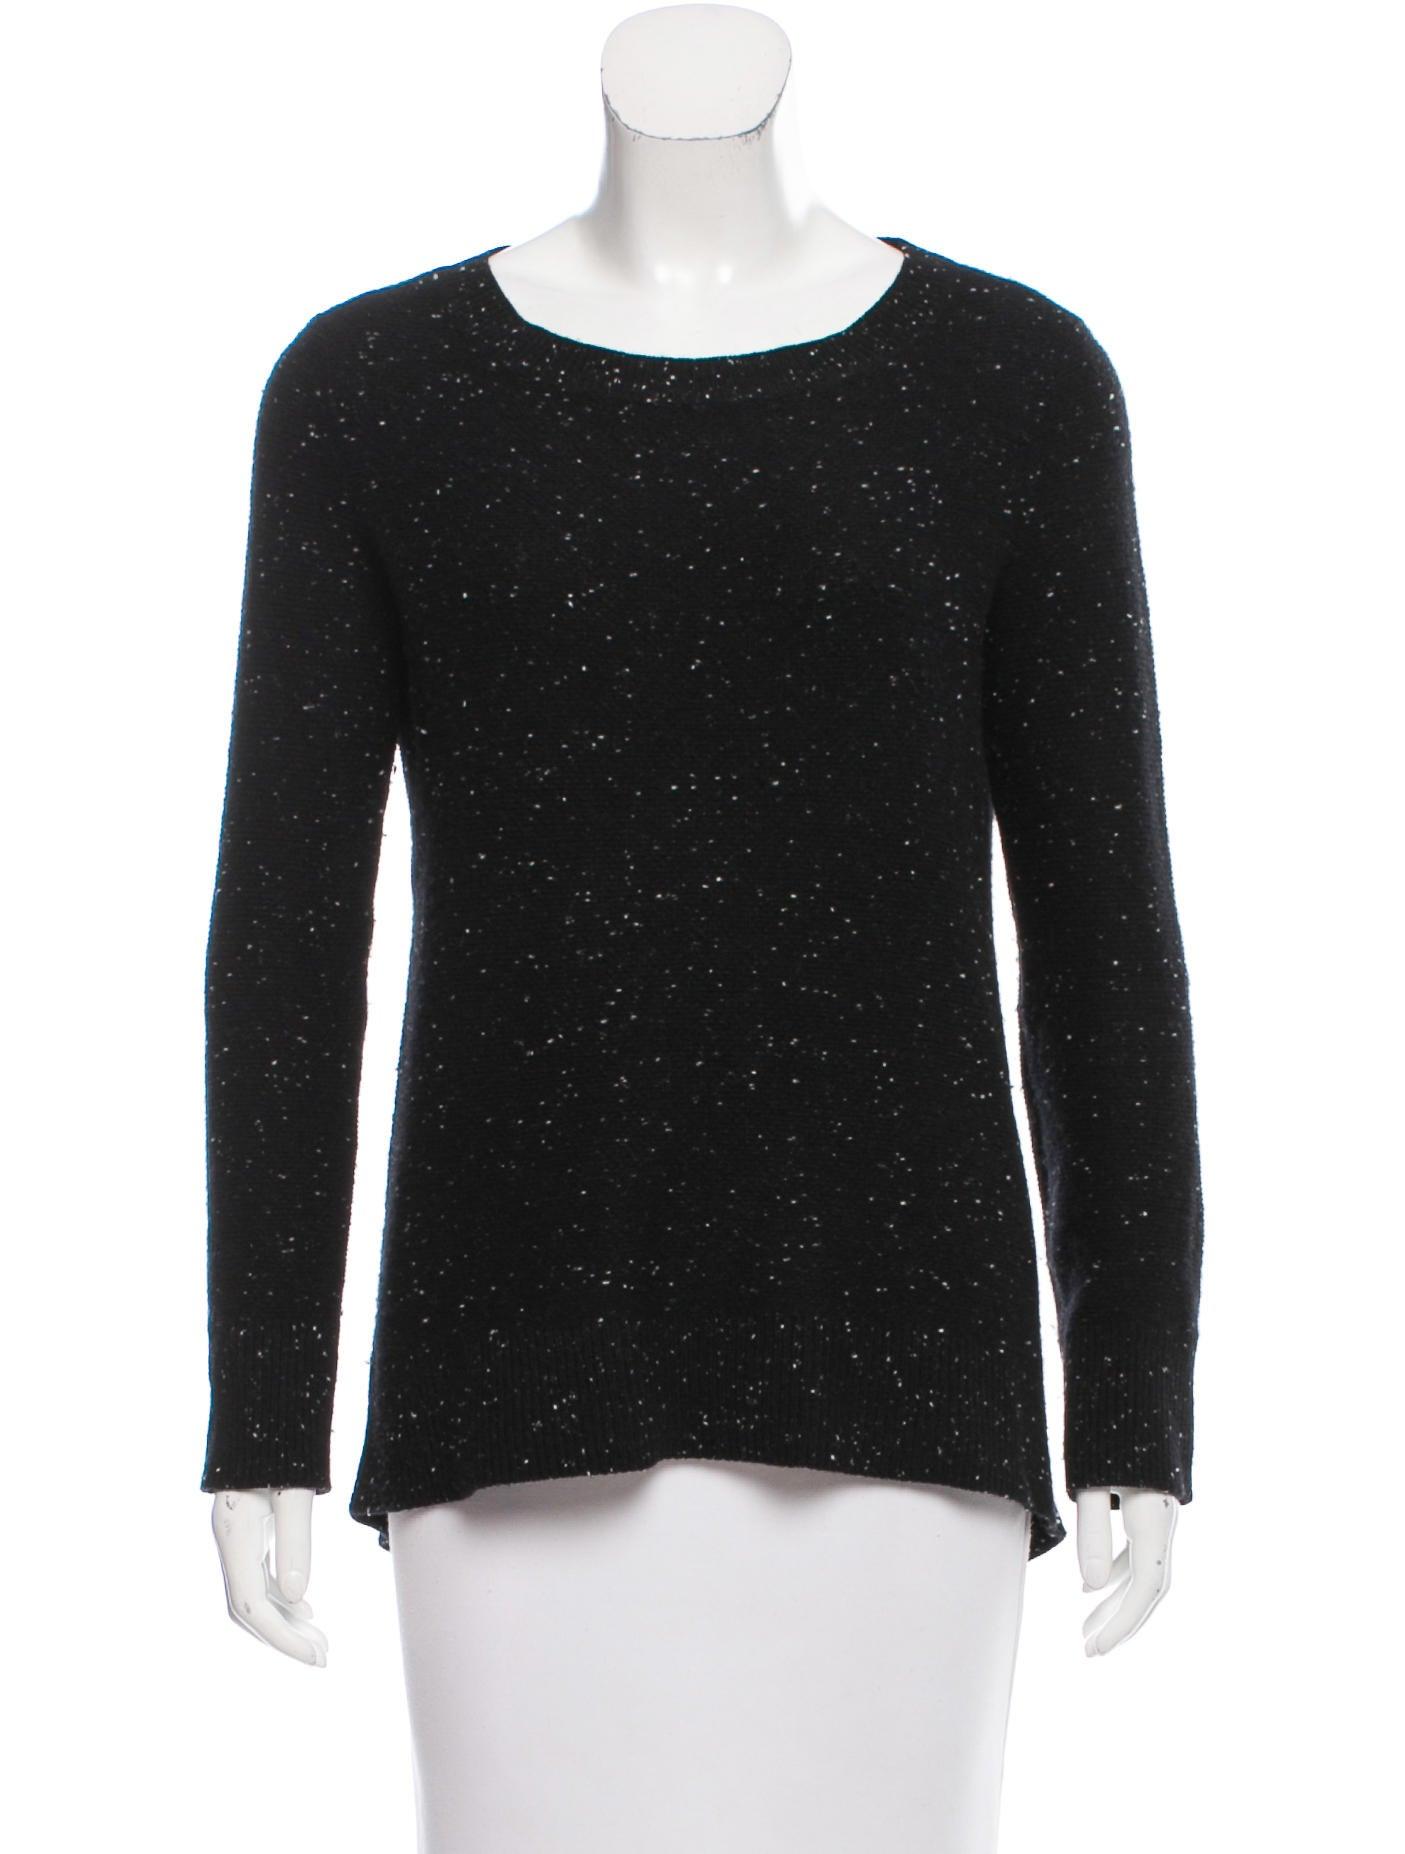 Rag & Bone Lightweight Cashmere Sweater - Clothing - WRAGB82217 ...